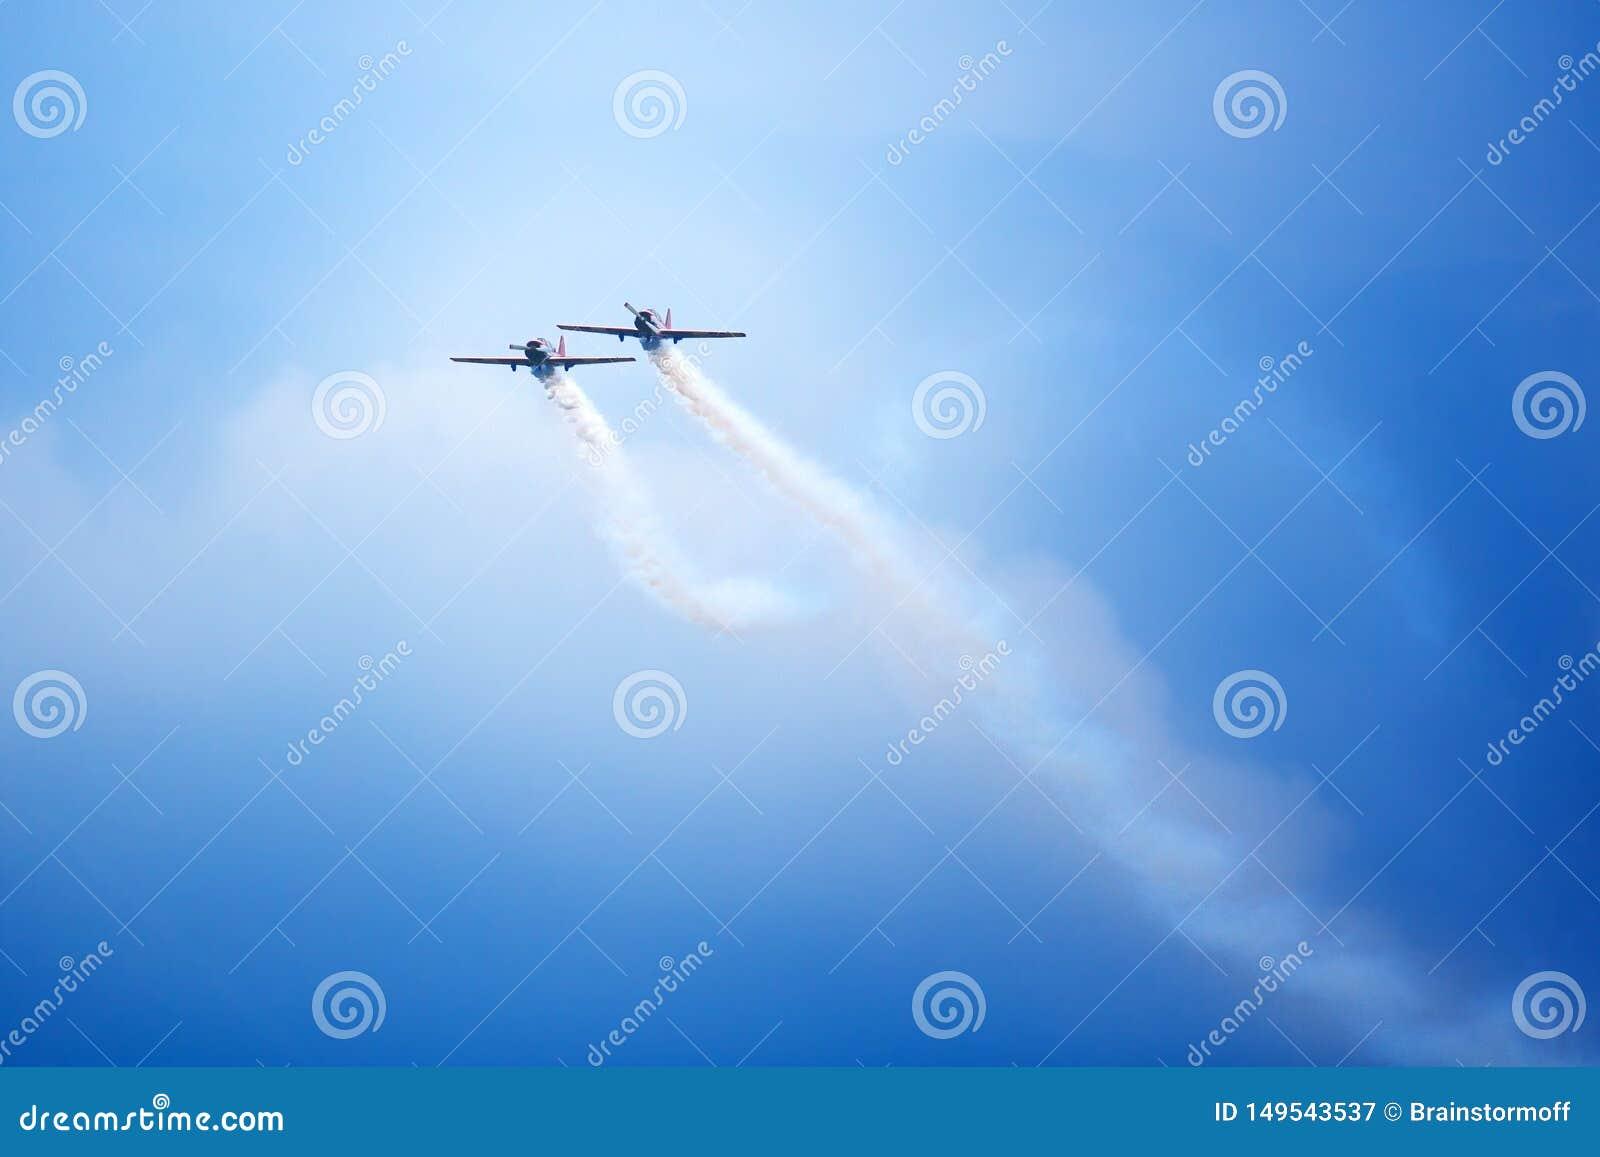 Mochishche机场,地方飞行表演,两一起飞行的雅克-52,特技队'露天'巴尔瑙尔